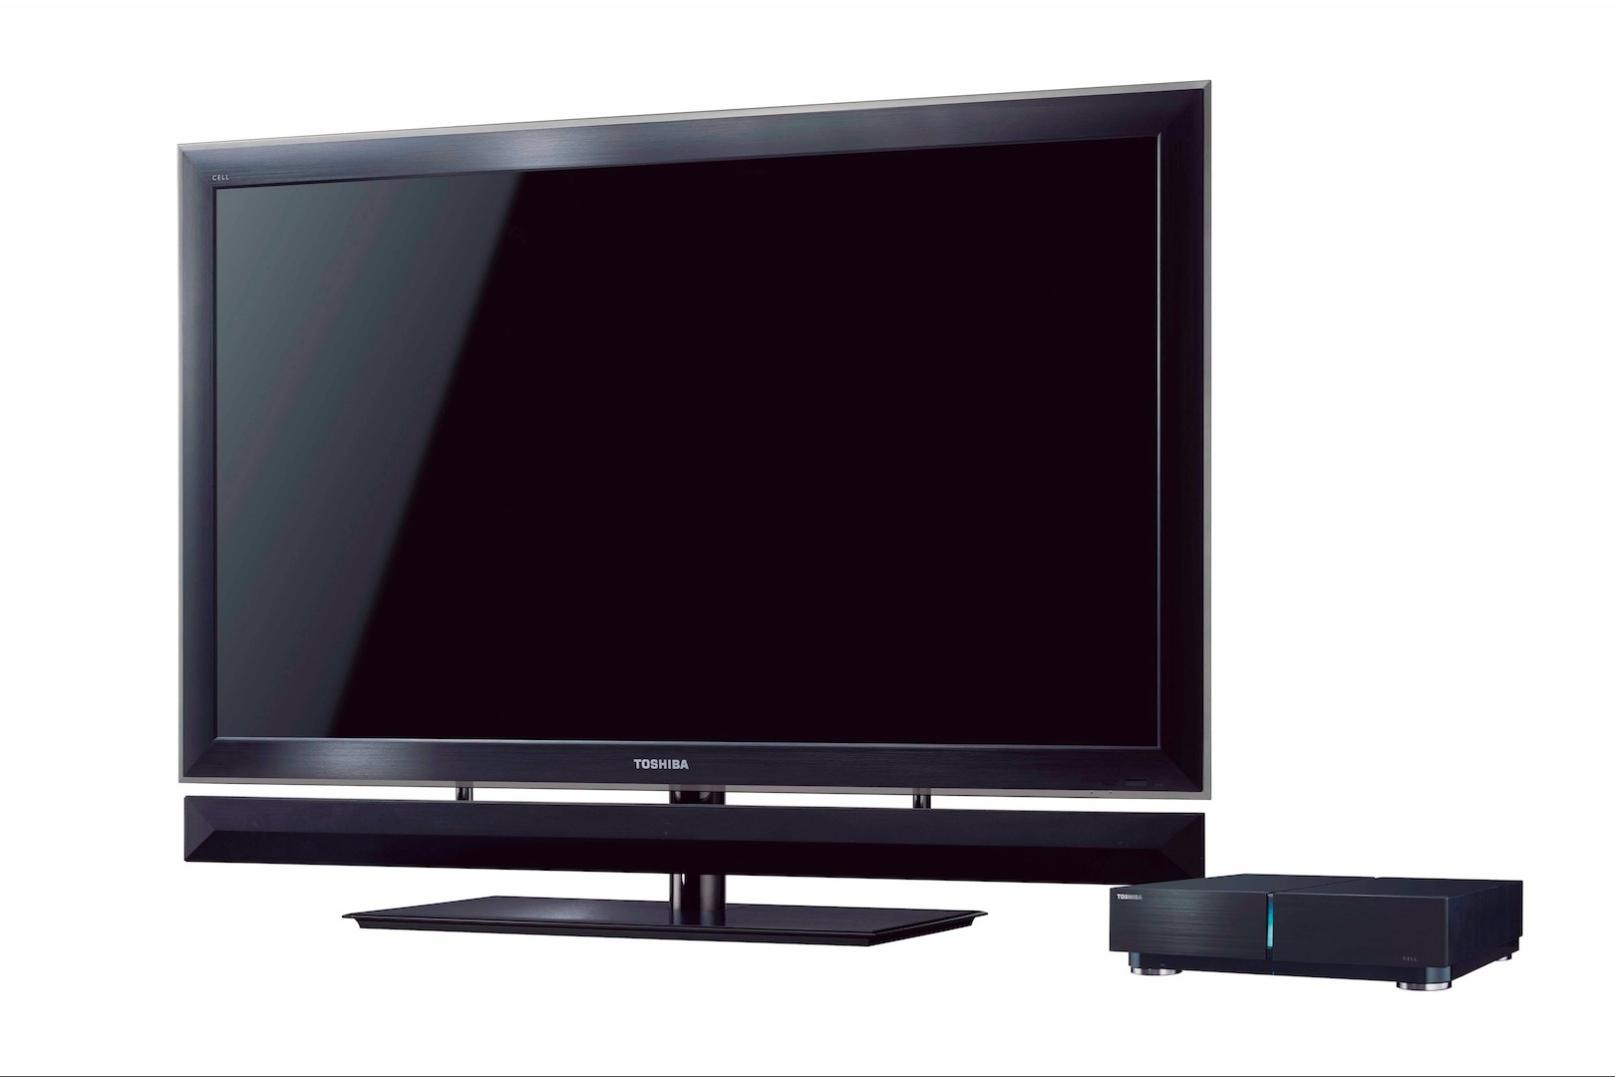 Toshiba Cell TVs